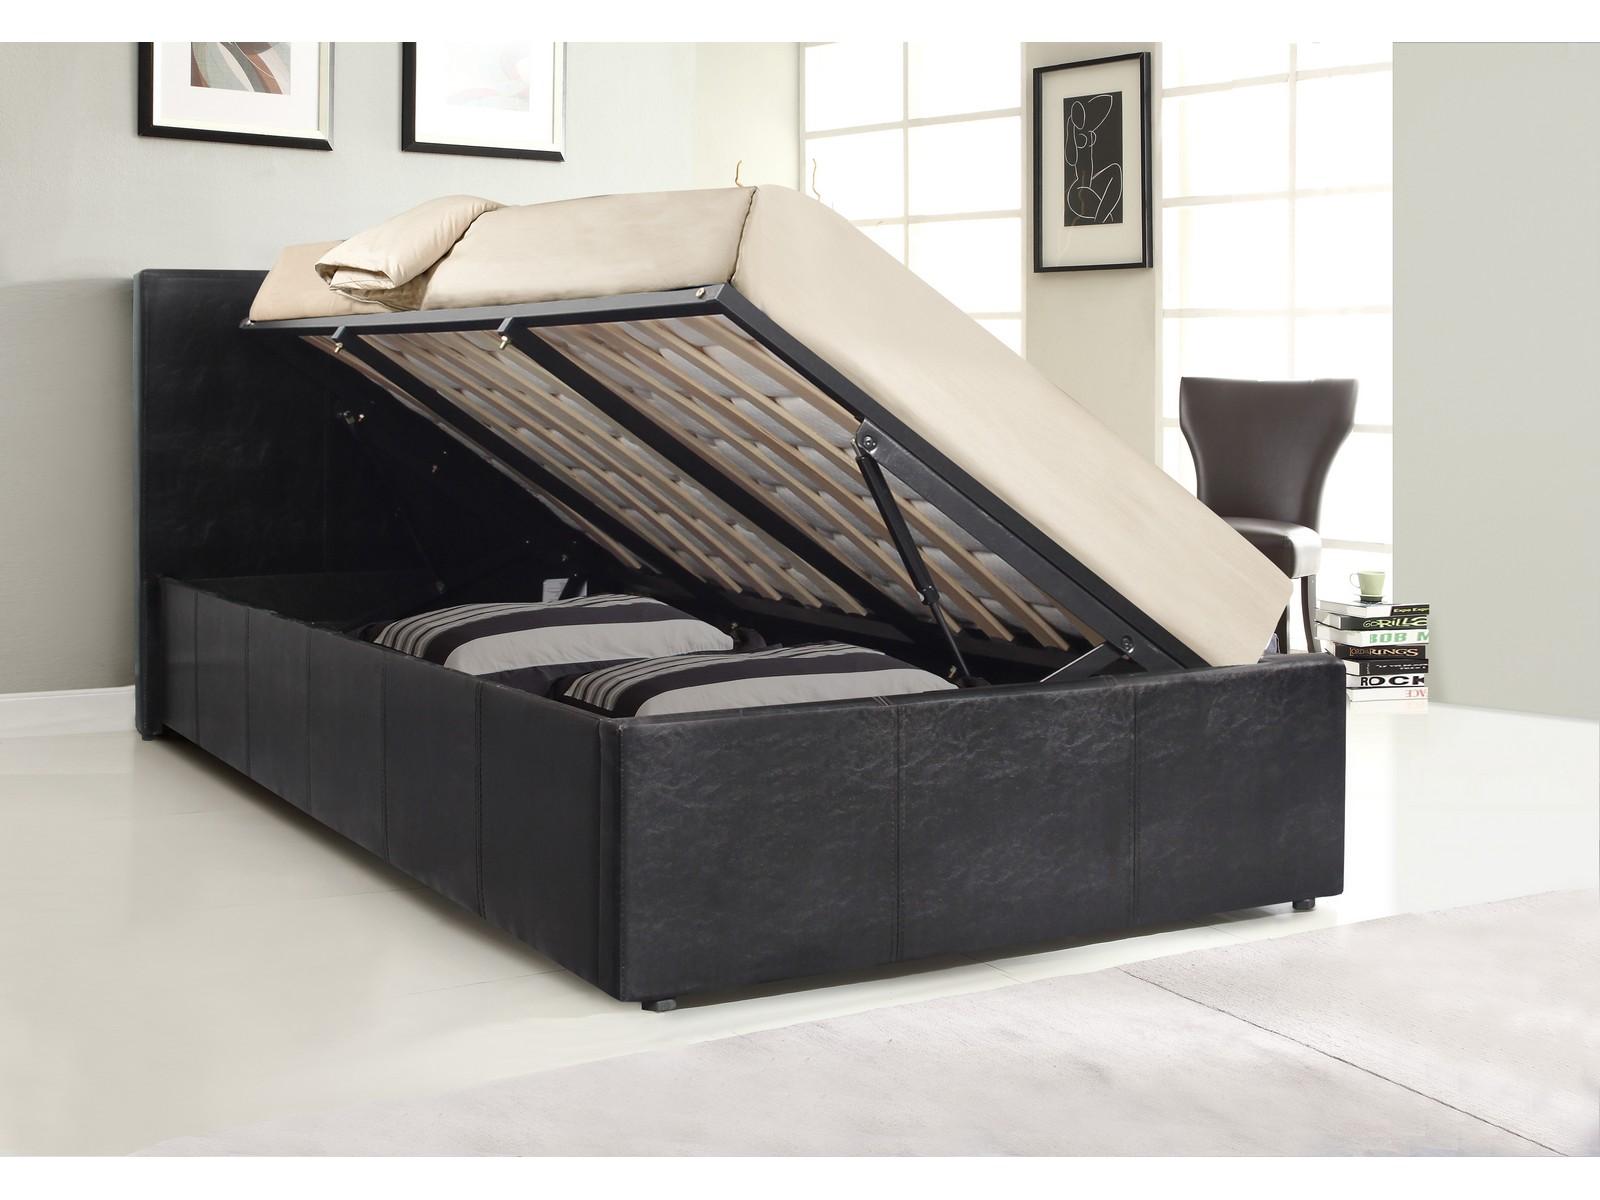 Fine Details About Gator Side Lift Ottoman Bed Mega Storage 3Ft Single Brown Creativecarmelina Interior Chair Design Creativecarmelinacom